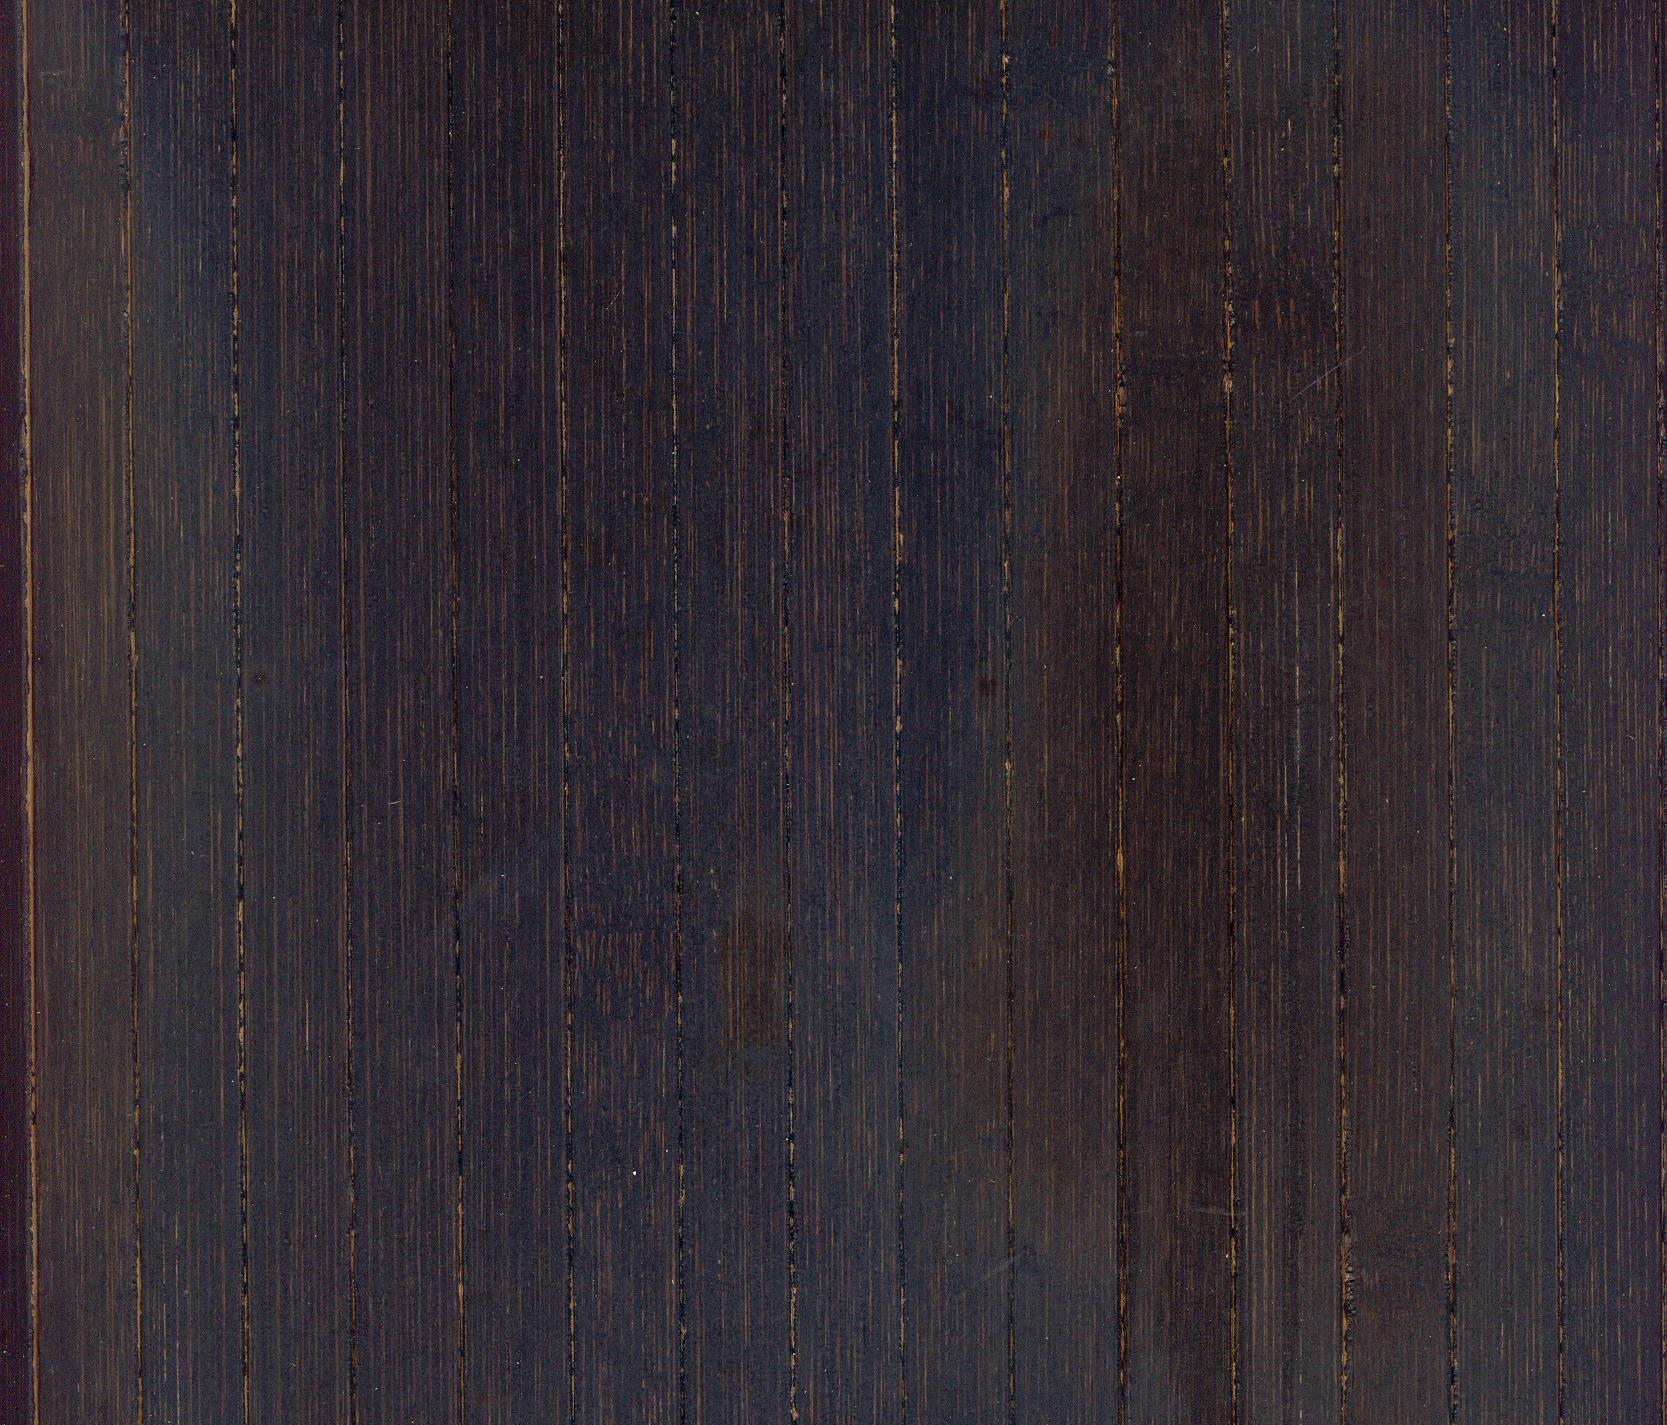 UNIBAMBOO PLAINPRESSED BLACK Bamboo flooring from MOSO bamboo